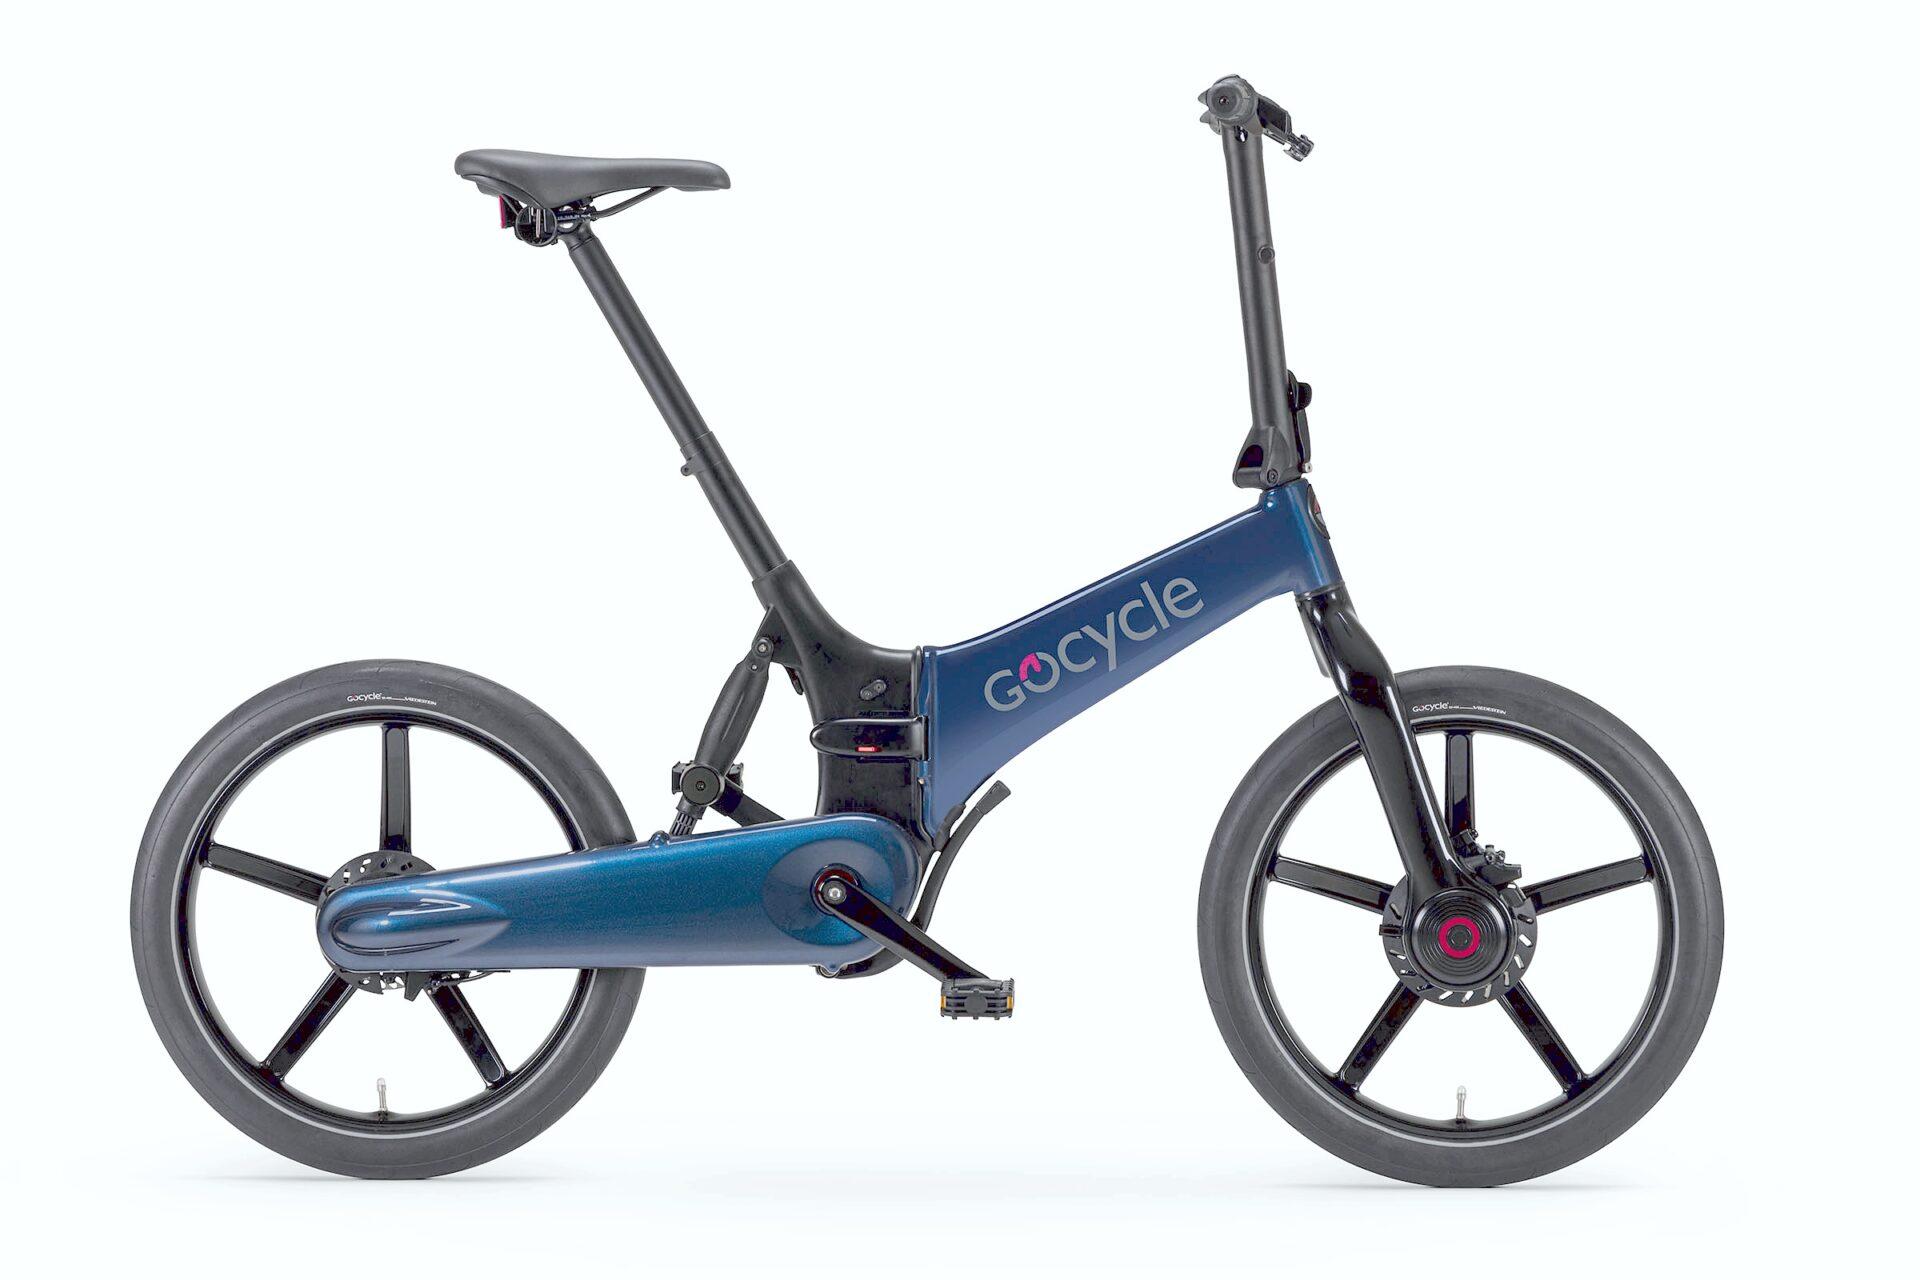 Gocycle G4 modra barva